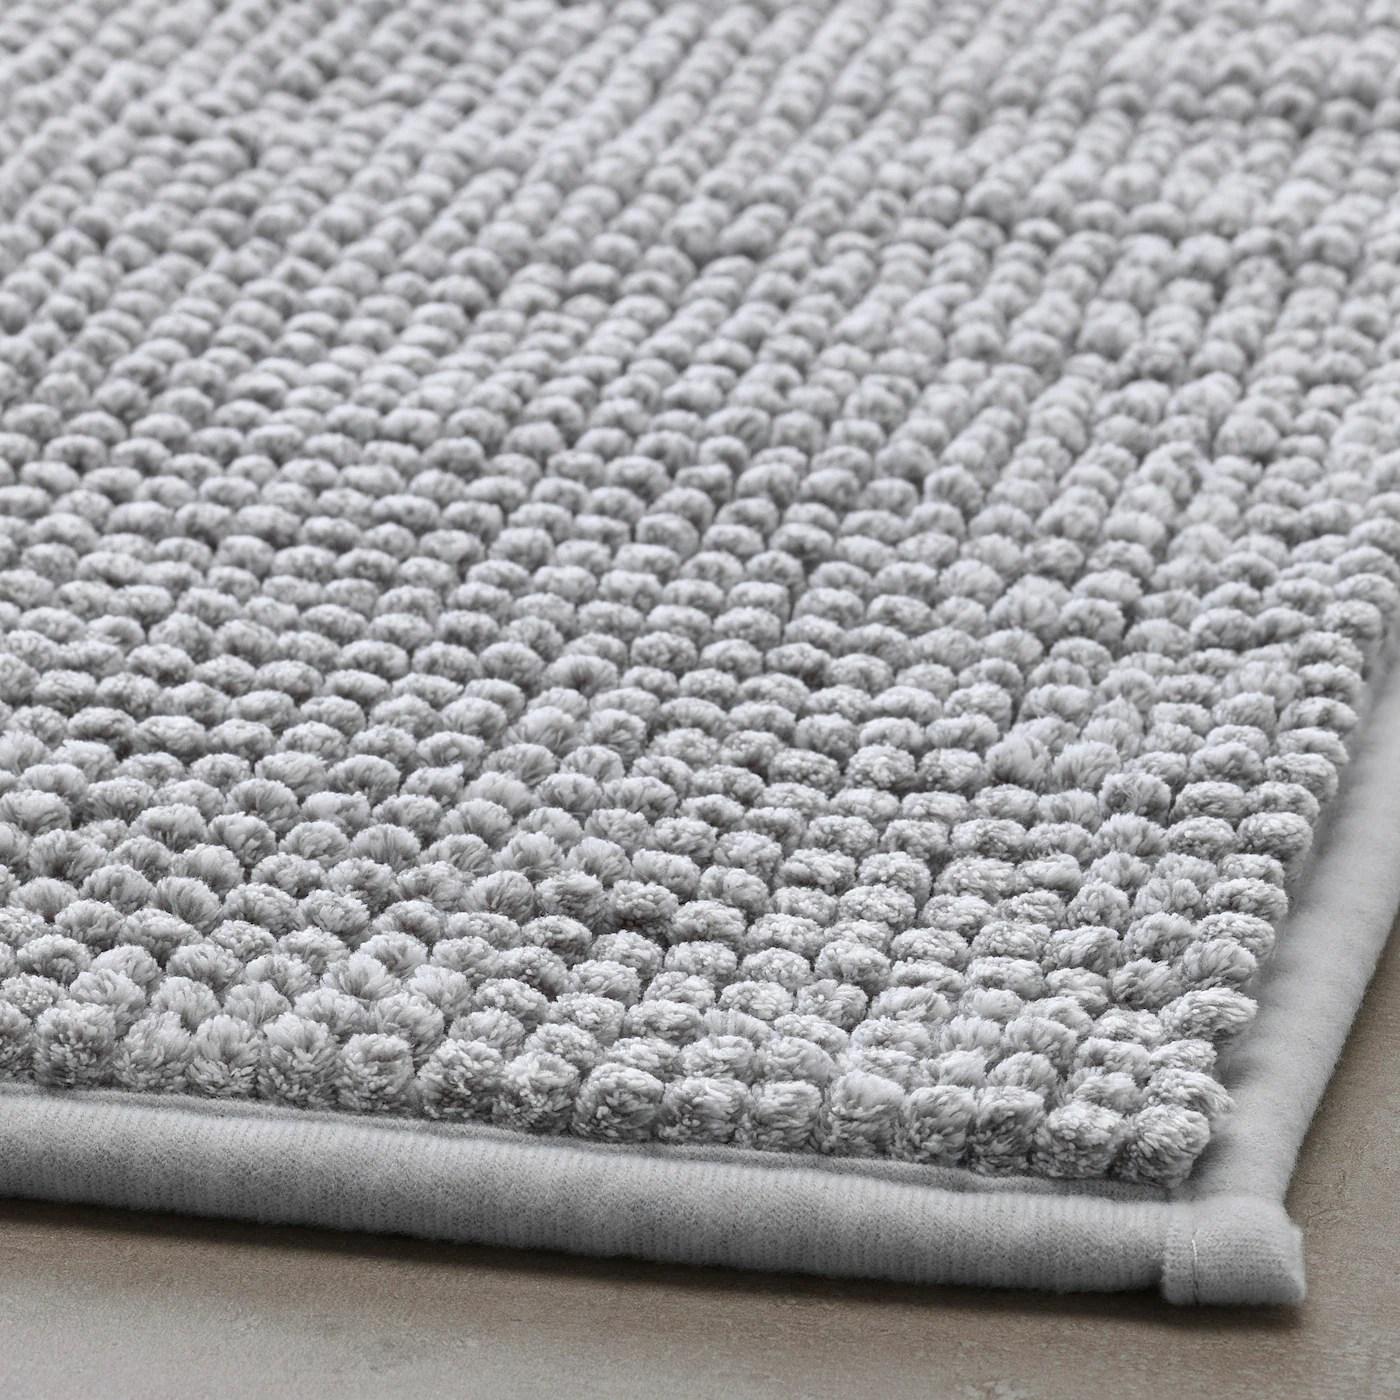 toftbo tapis de bain blanc gris melange 50x80 cm